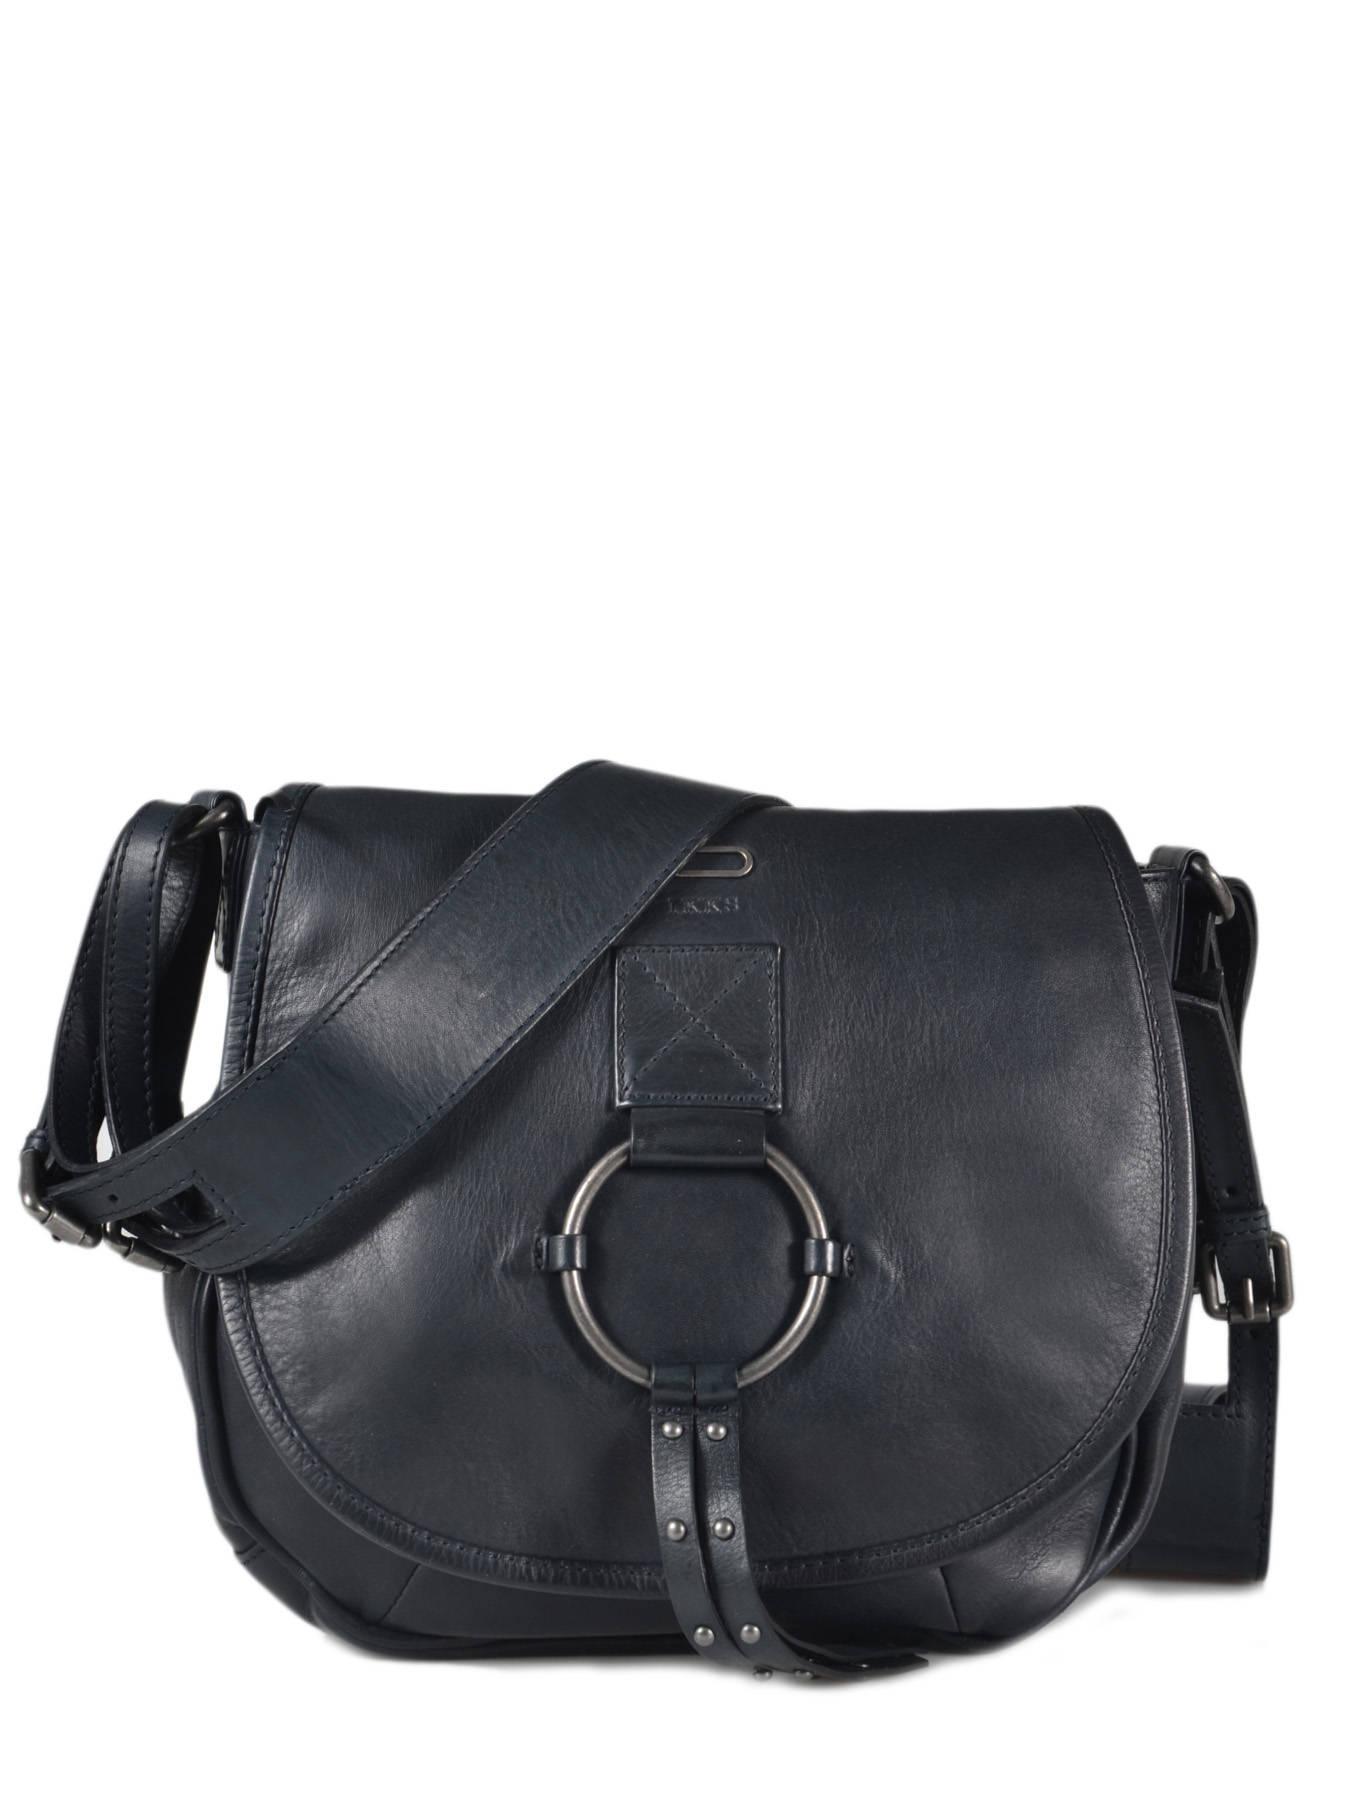 sélection premium 48fb1 f58e3 SAC BANDOULIERE Mexican leather IKKS